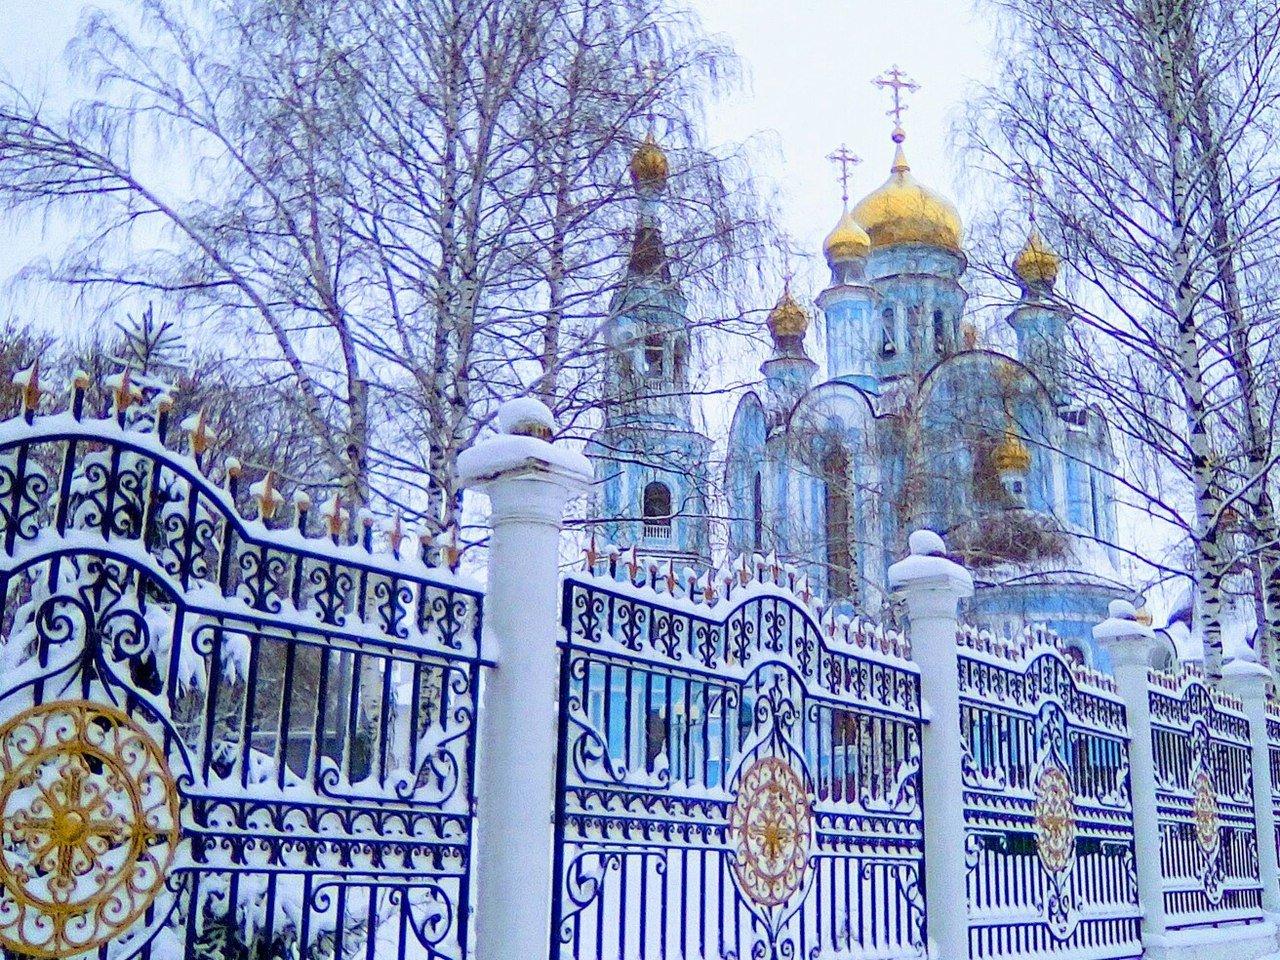 Фото 99gh0HpdbRY.jpg. Россия, Чувашская республика, Чебоксары, улица Гузовского, 15